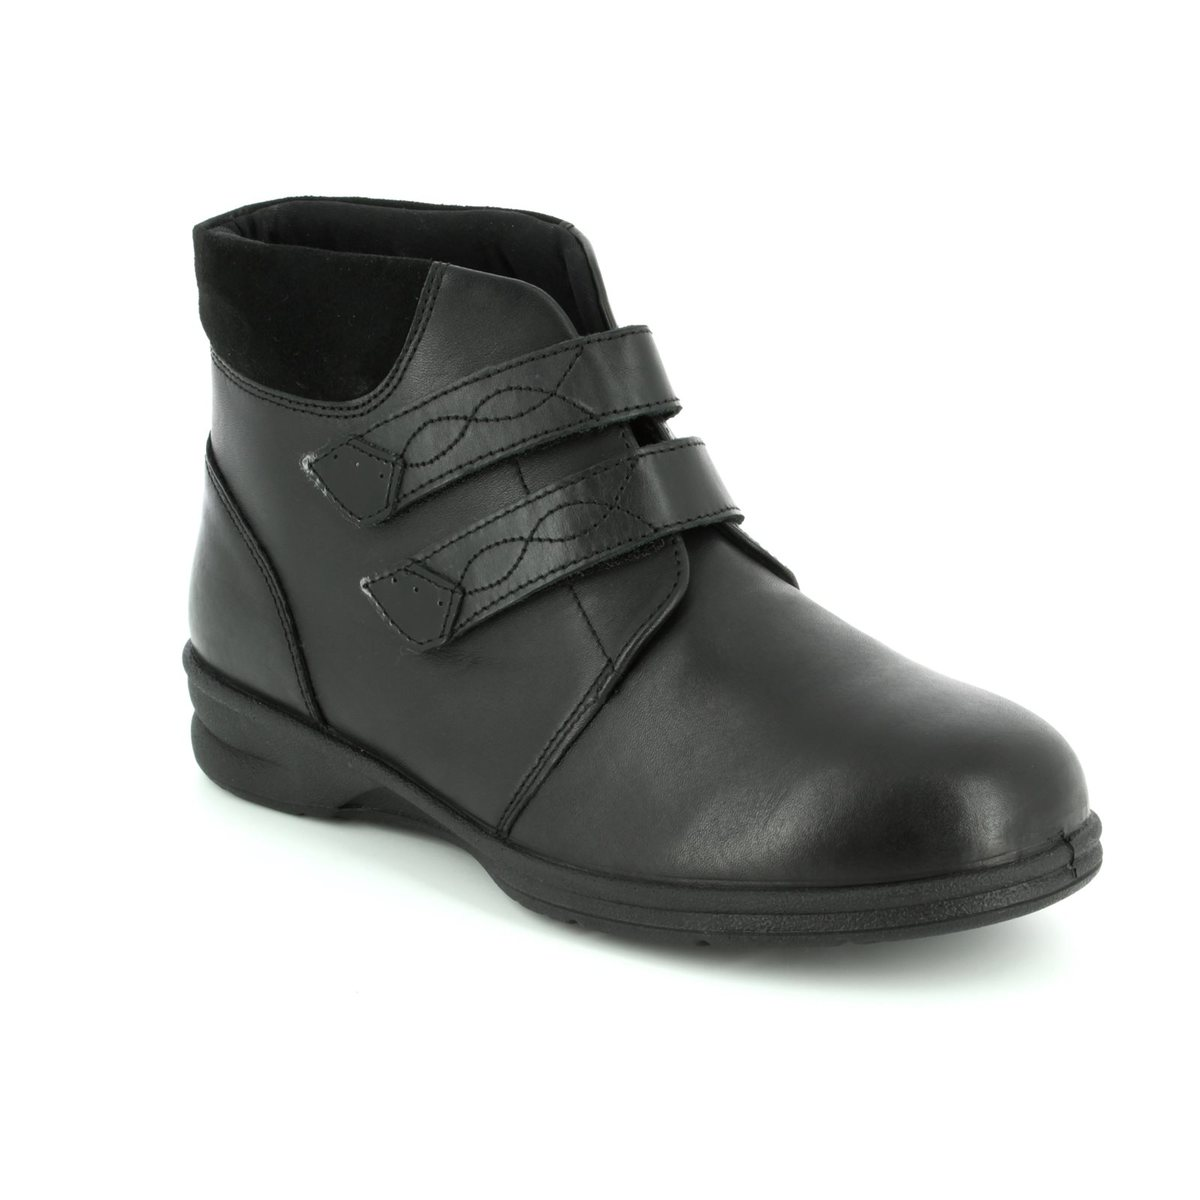 d7d3285308f Padders Ankle Boots - Black - 0361 38 KATHY 4E-6E FIT